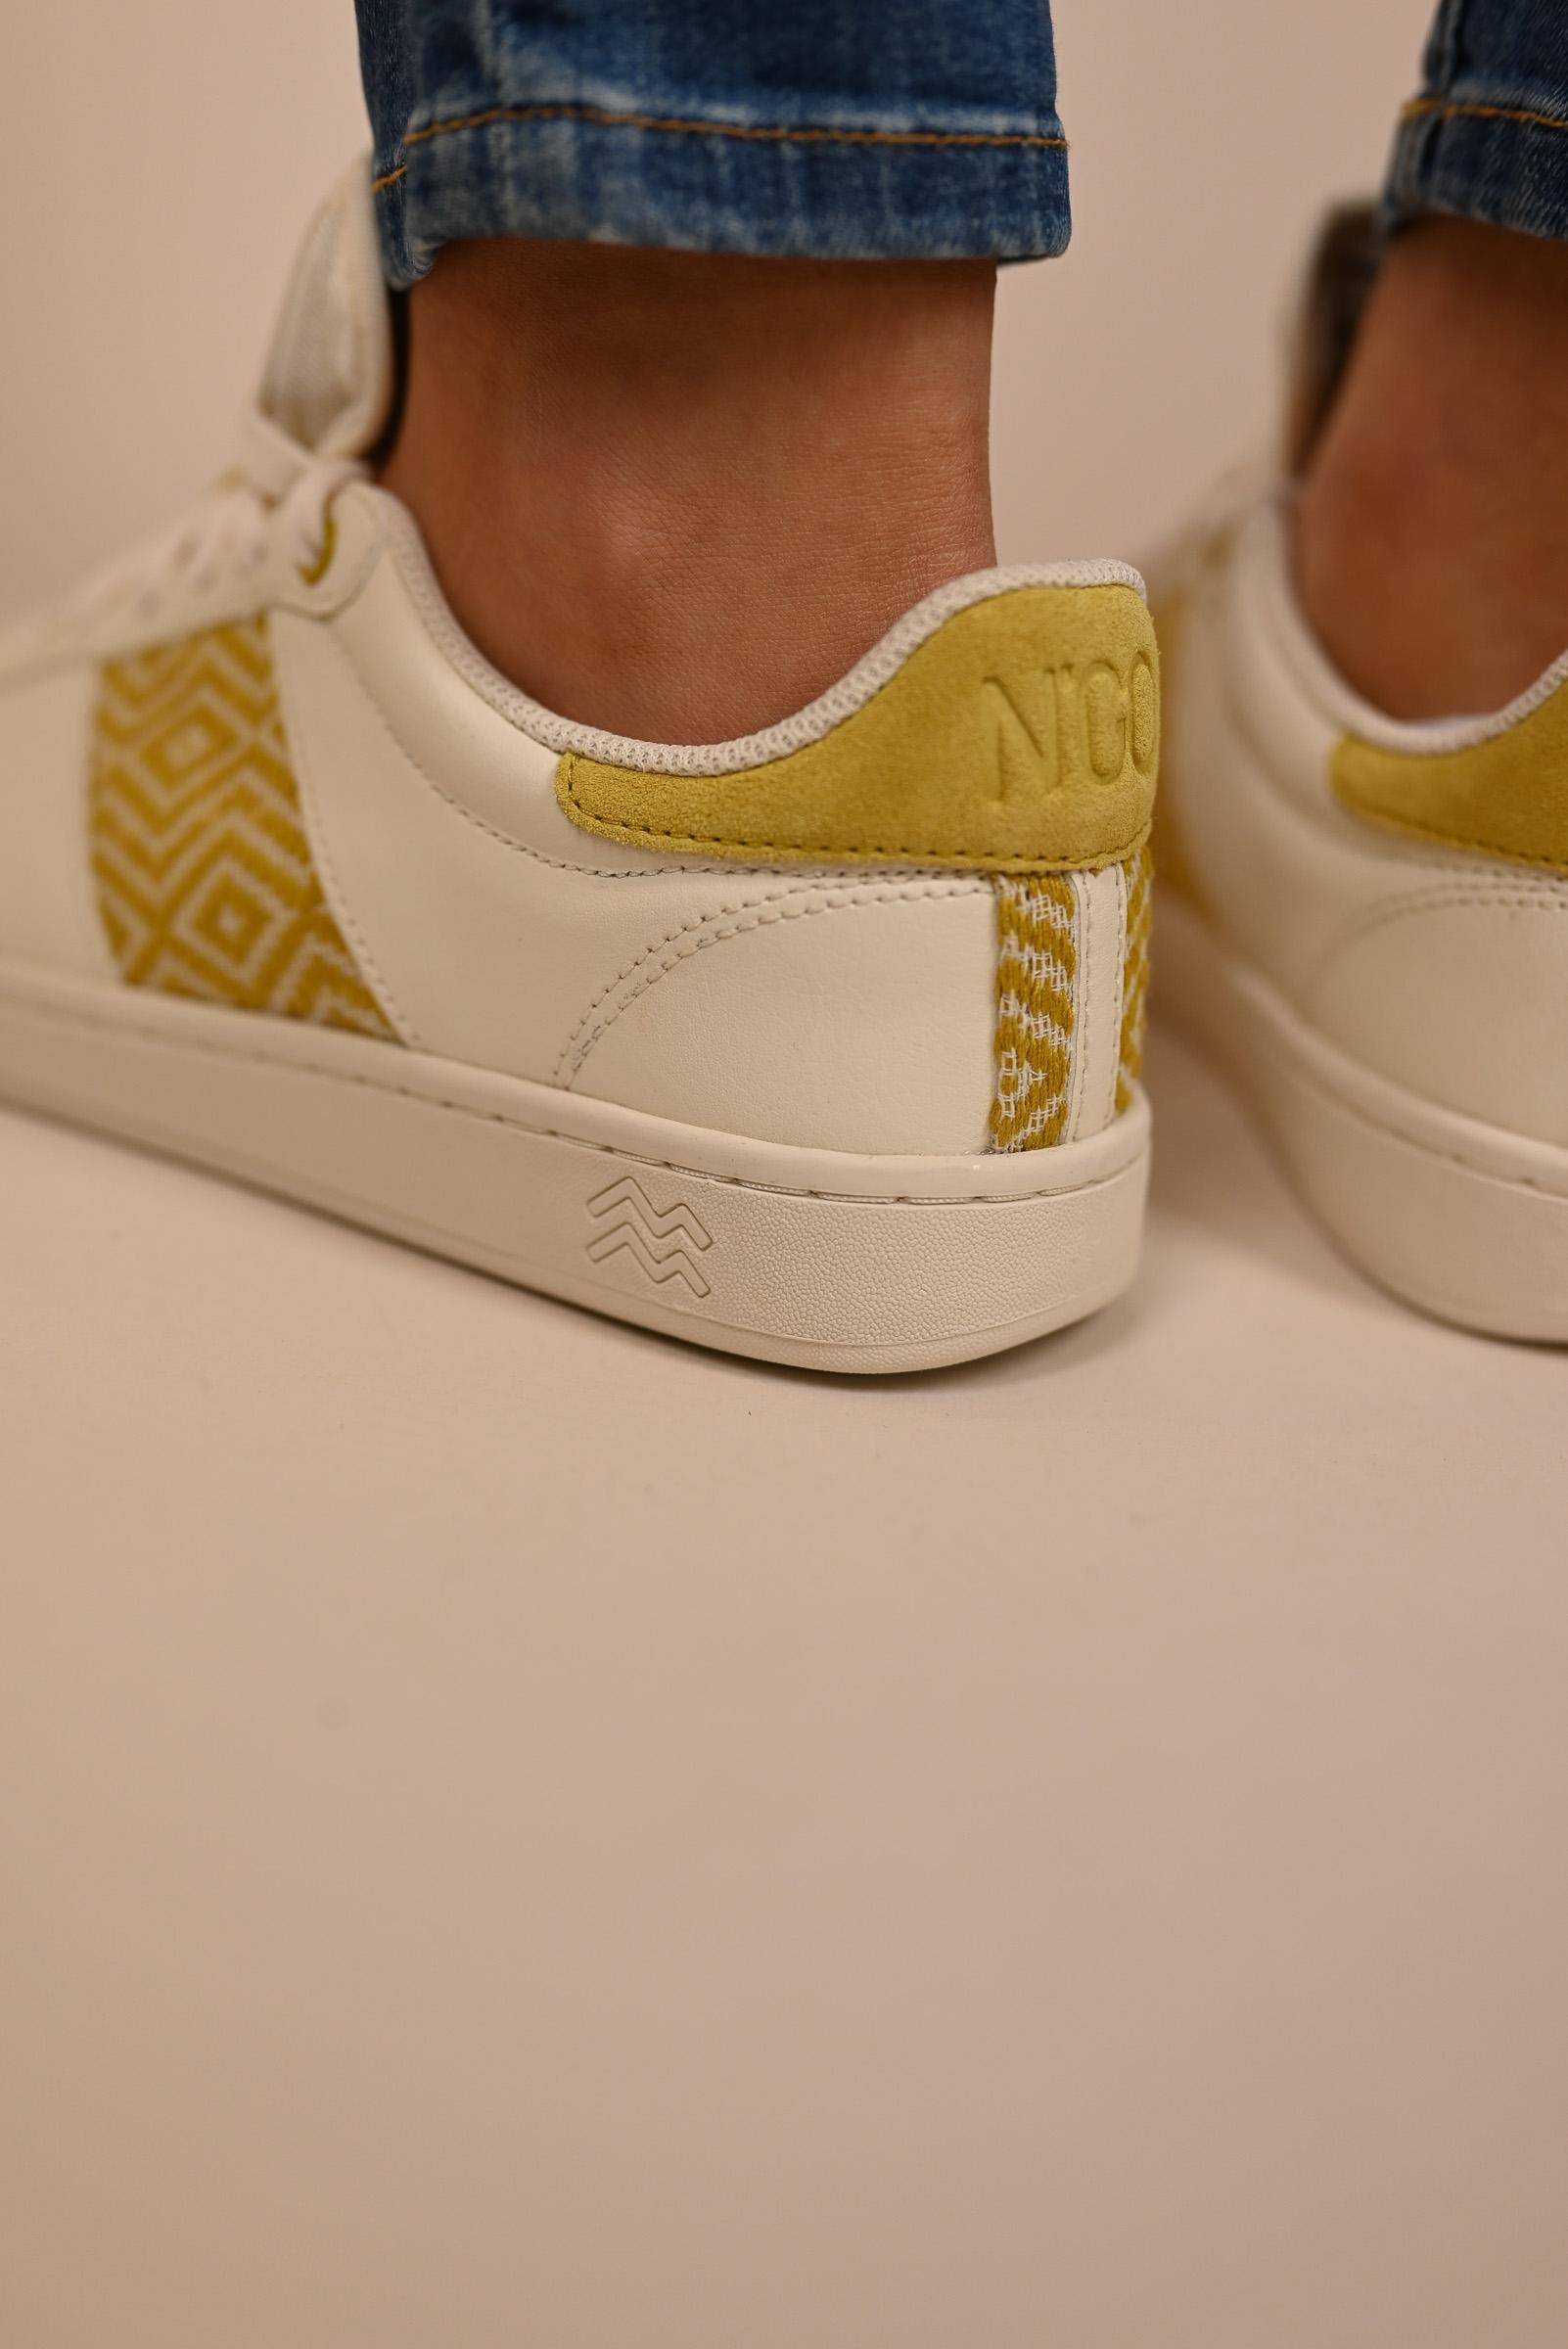 N'GO Sneaker HA GIANG  cream/yellow